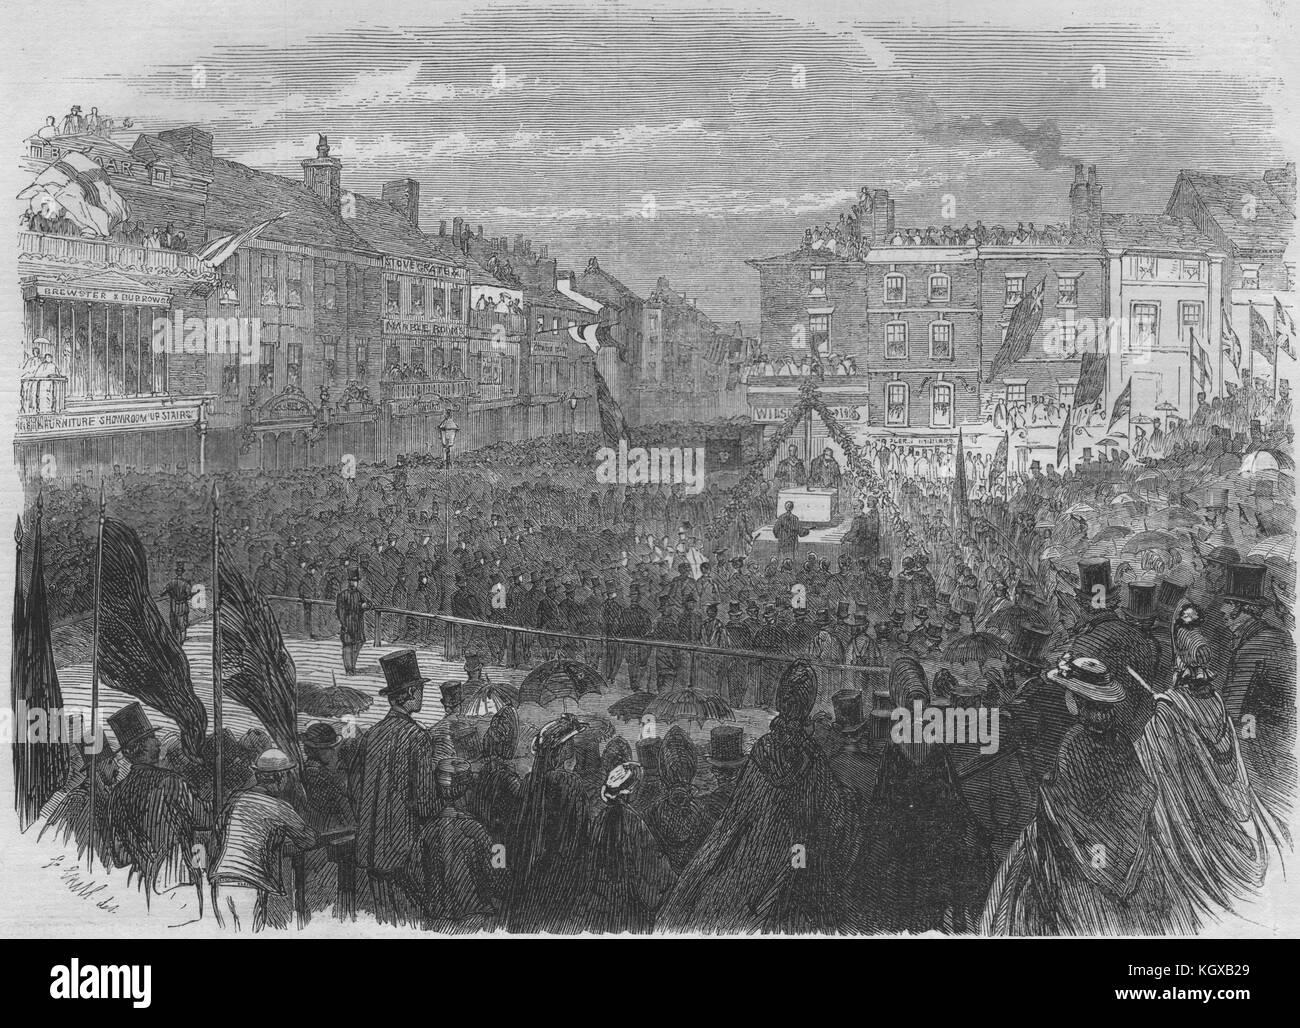 Mayor laying keystone of the new Preston town hall. Lancashire 1862. The Illustrated London News - Stock Image